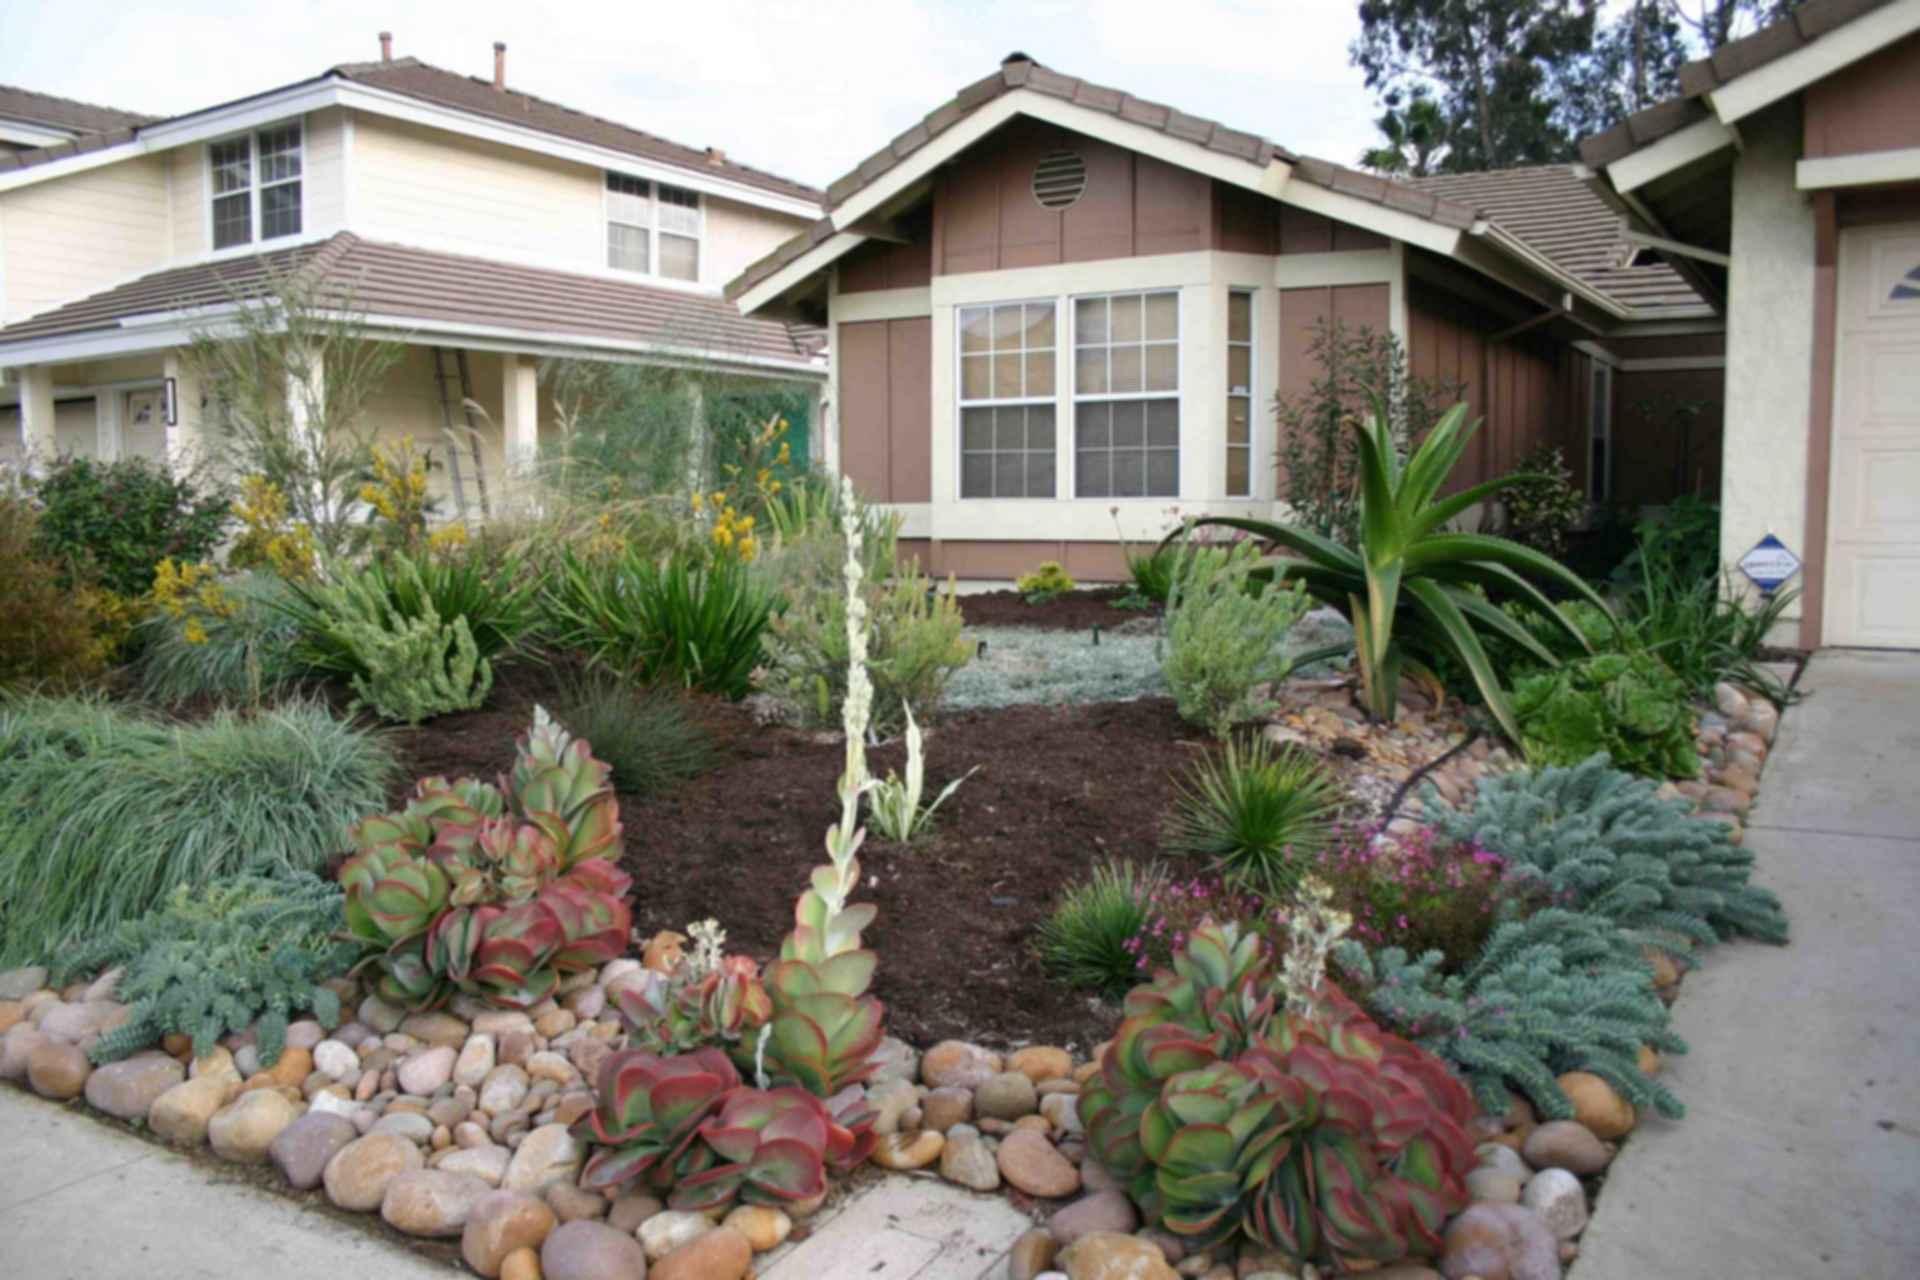 Front Yard - Cactus